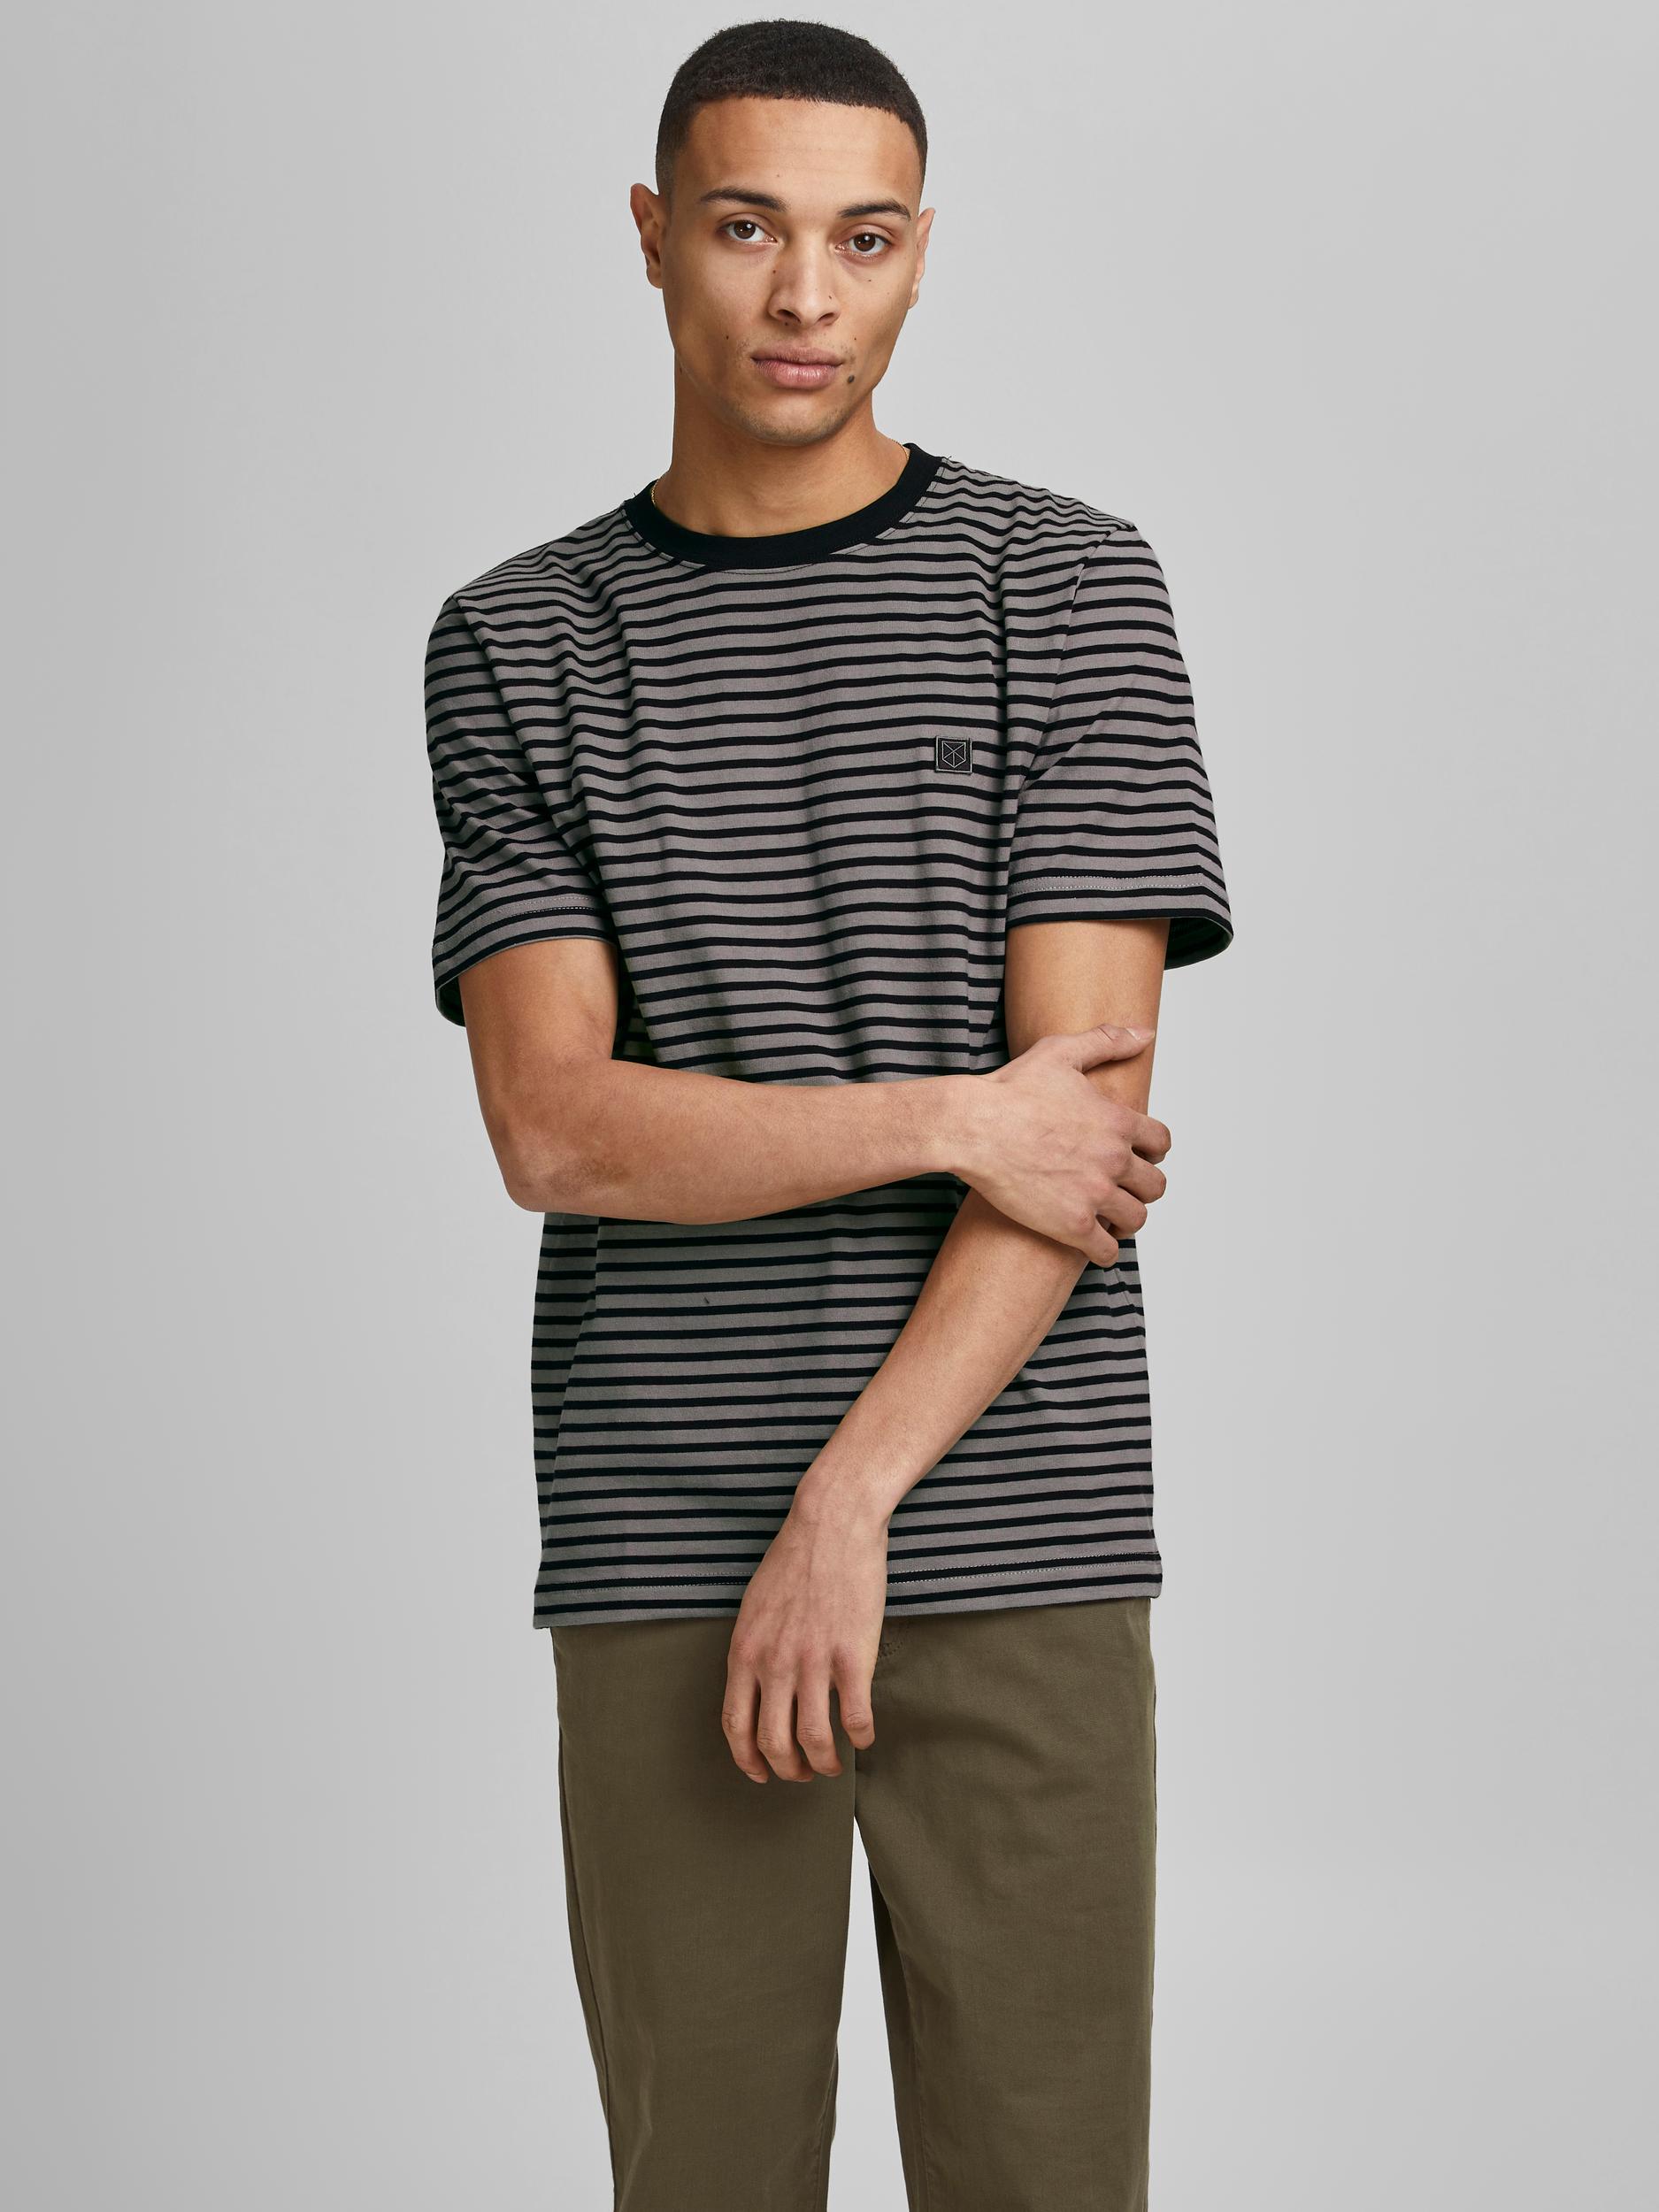 Jack & Jones blastudio t-shirt, new sage, xx-large